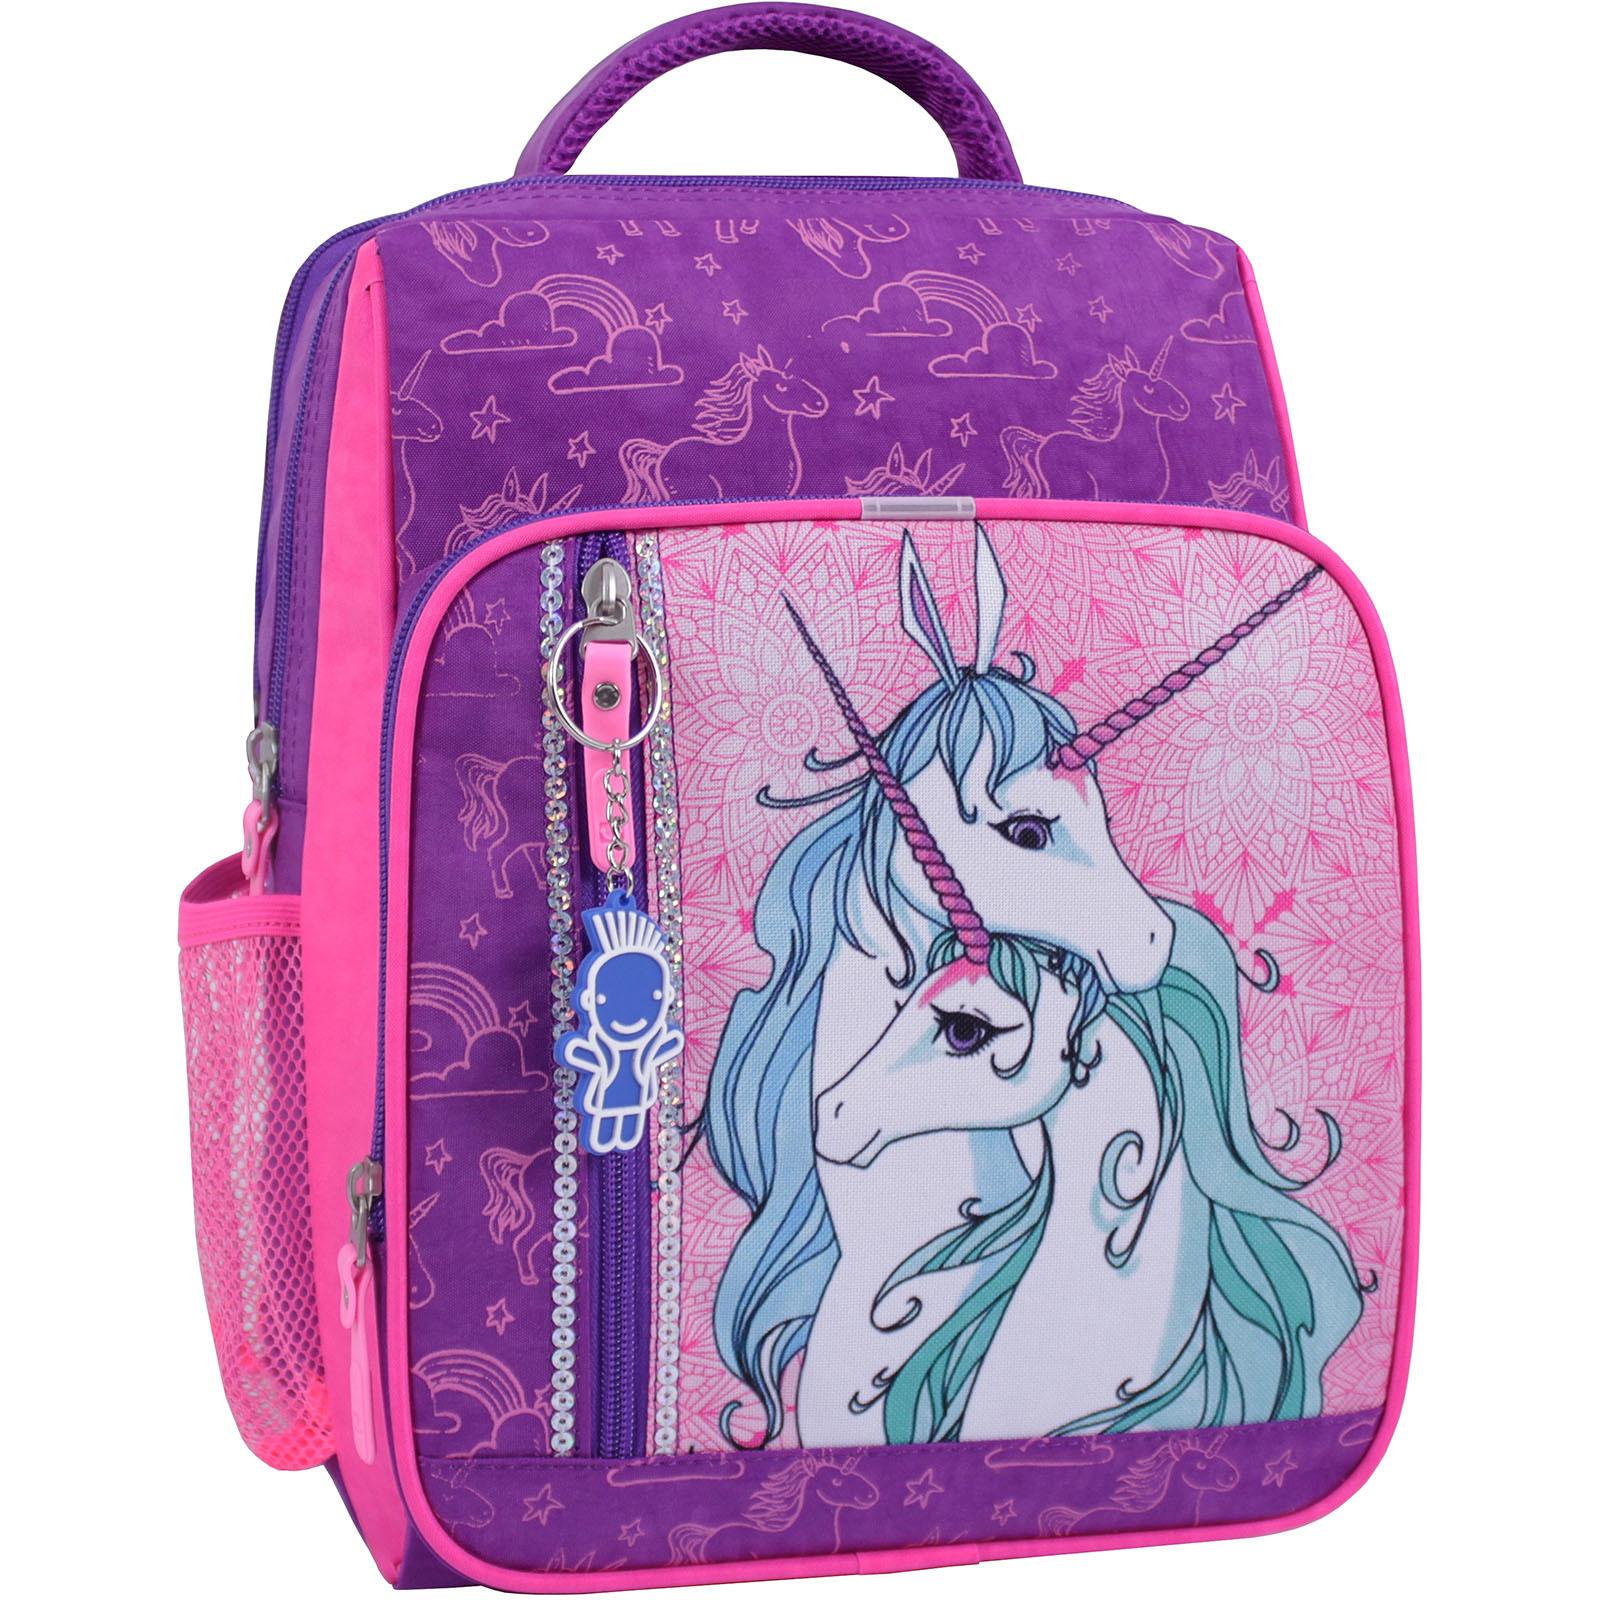 Школьные рюкзаки Рюкзак школьный Bagland Школьник 8 л. Фиолетовый 596 (00112702) IMG_1583_суб.596_.JPG